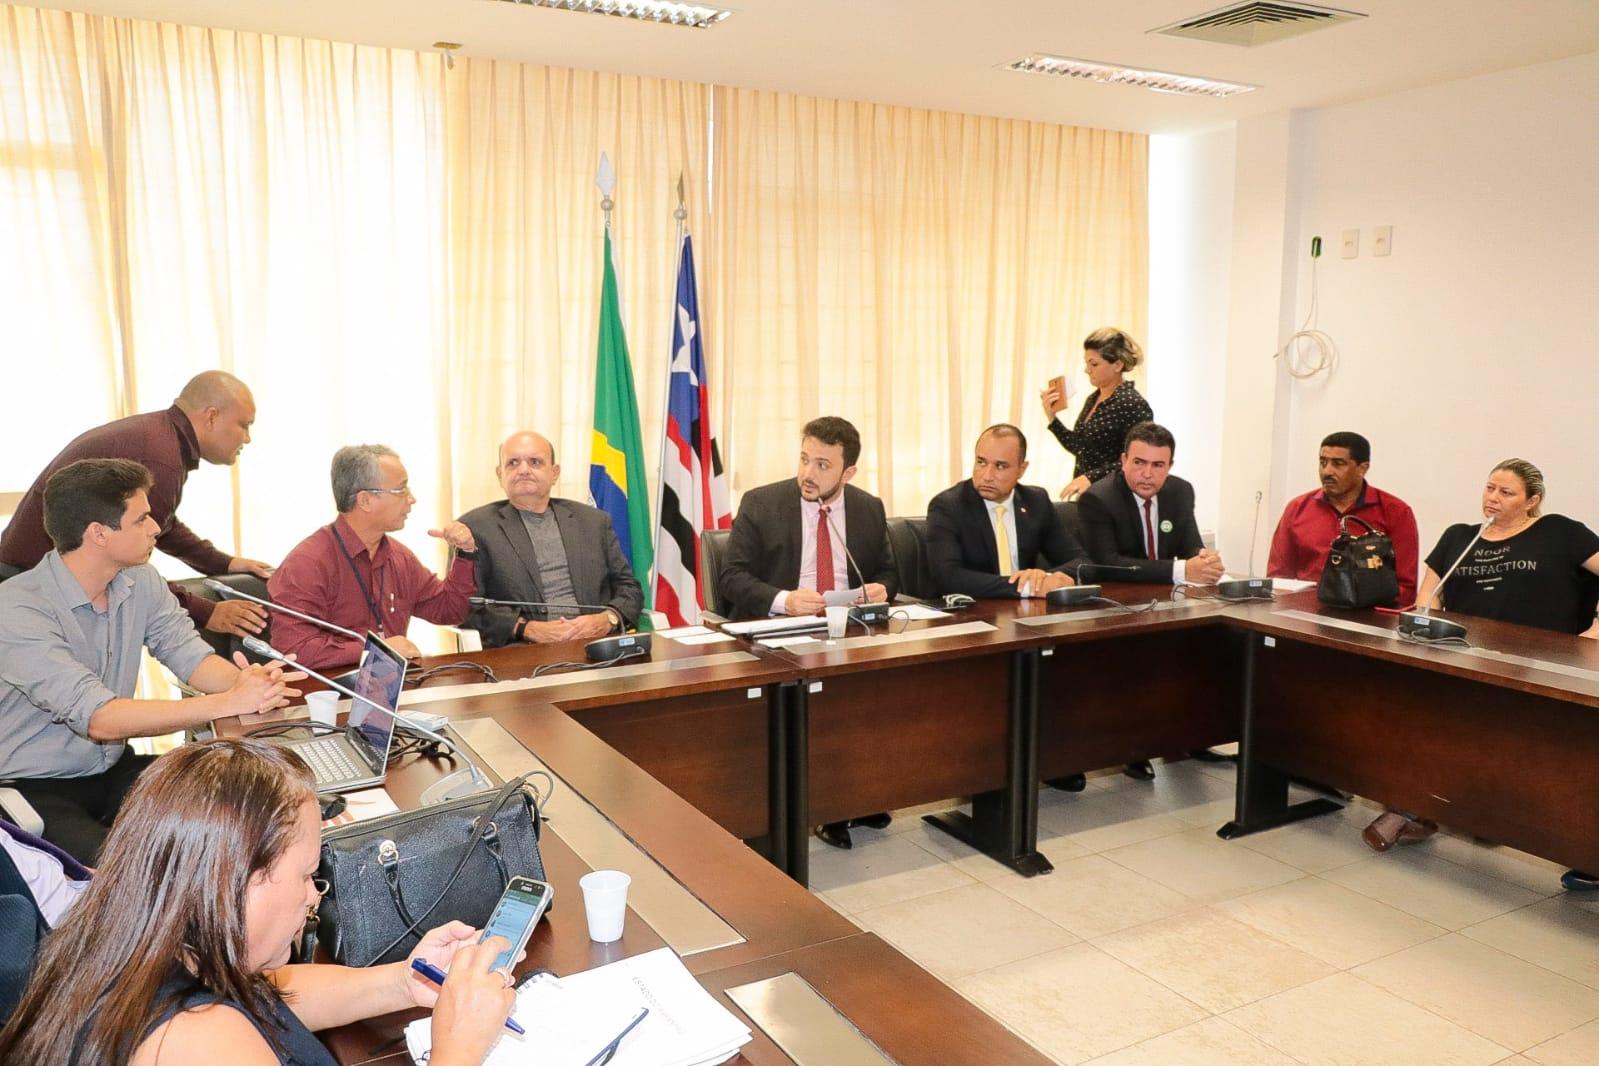 Audiência pública discute limites territoriais de quatro municípios